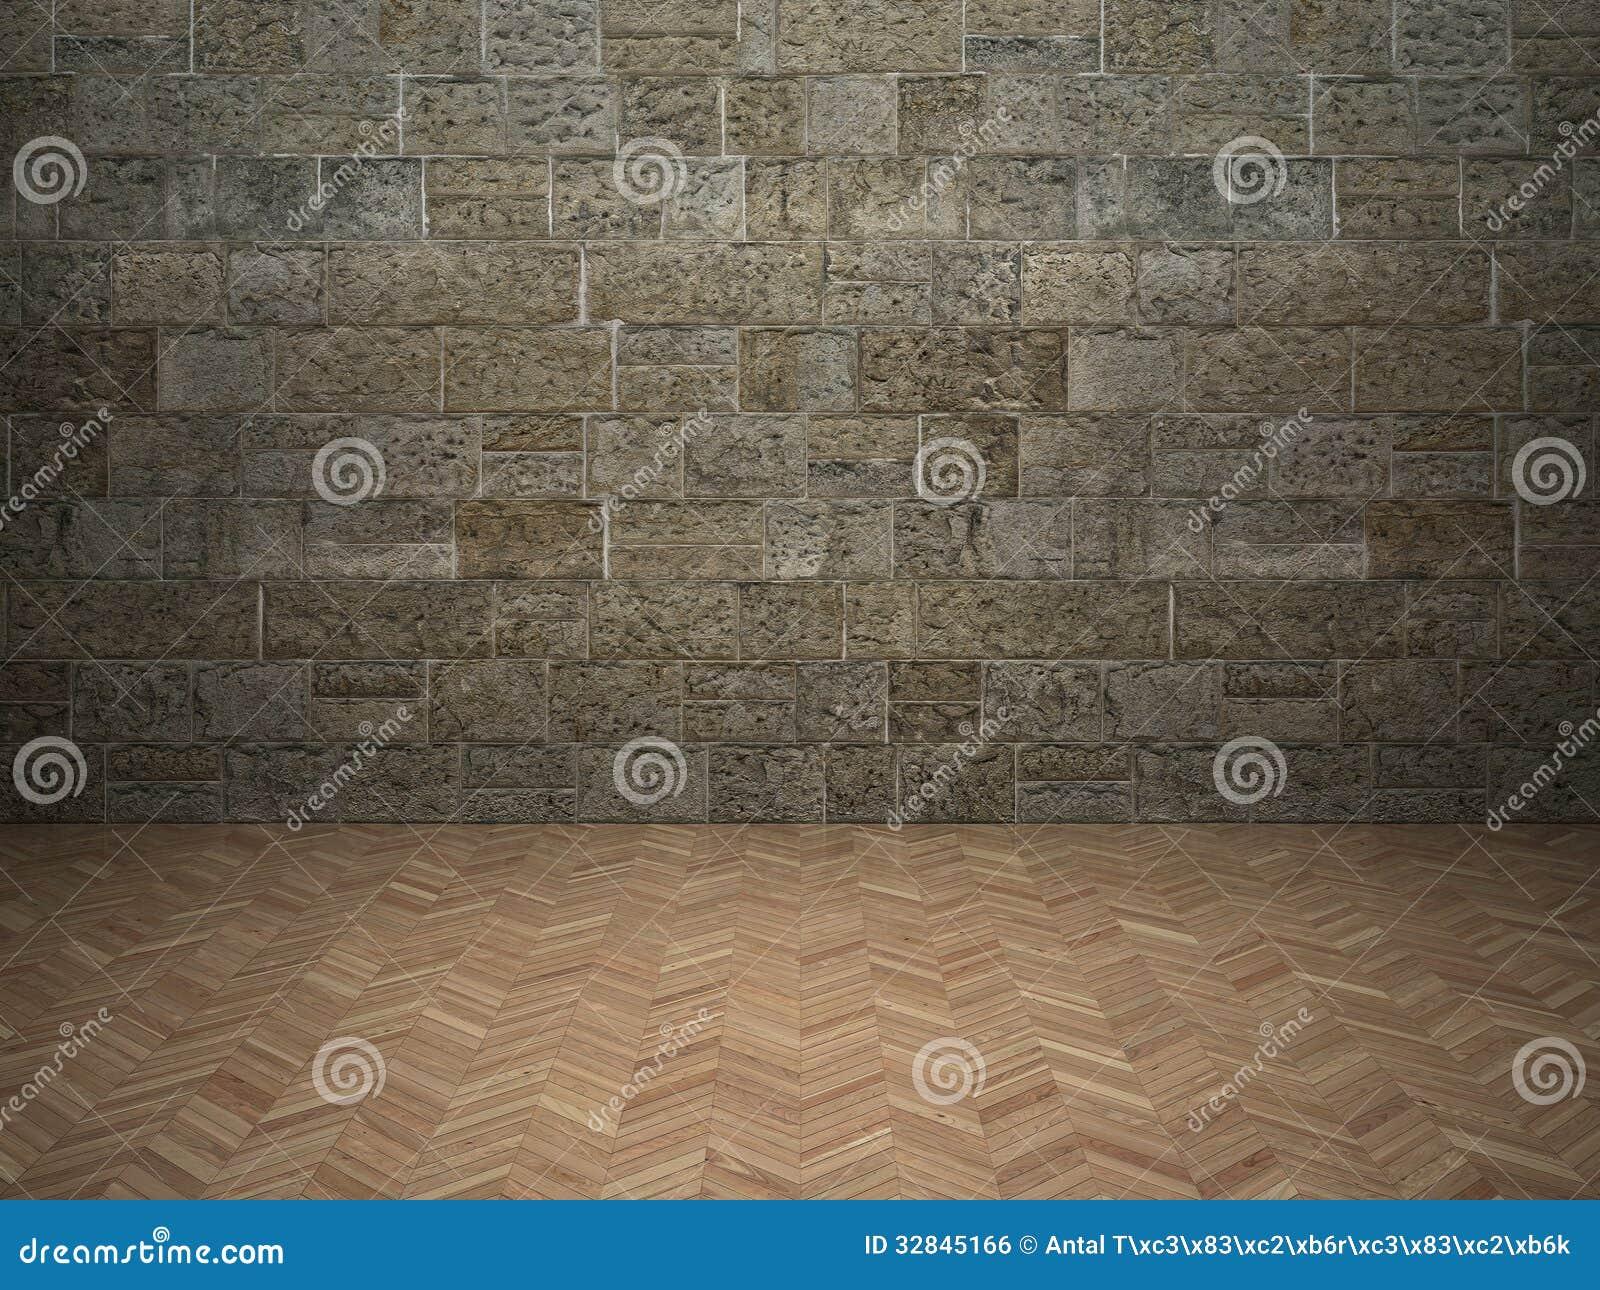 brick wall and laminate floor royalty free stock image